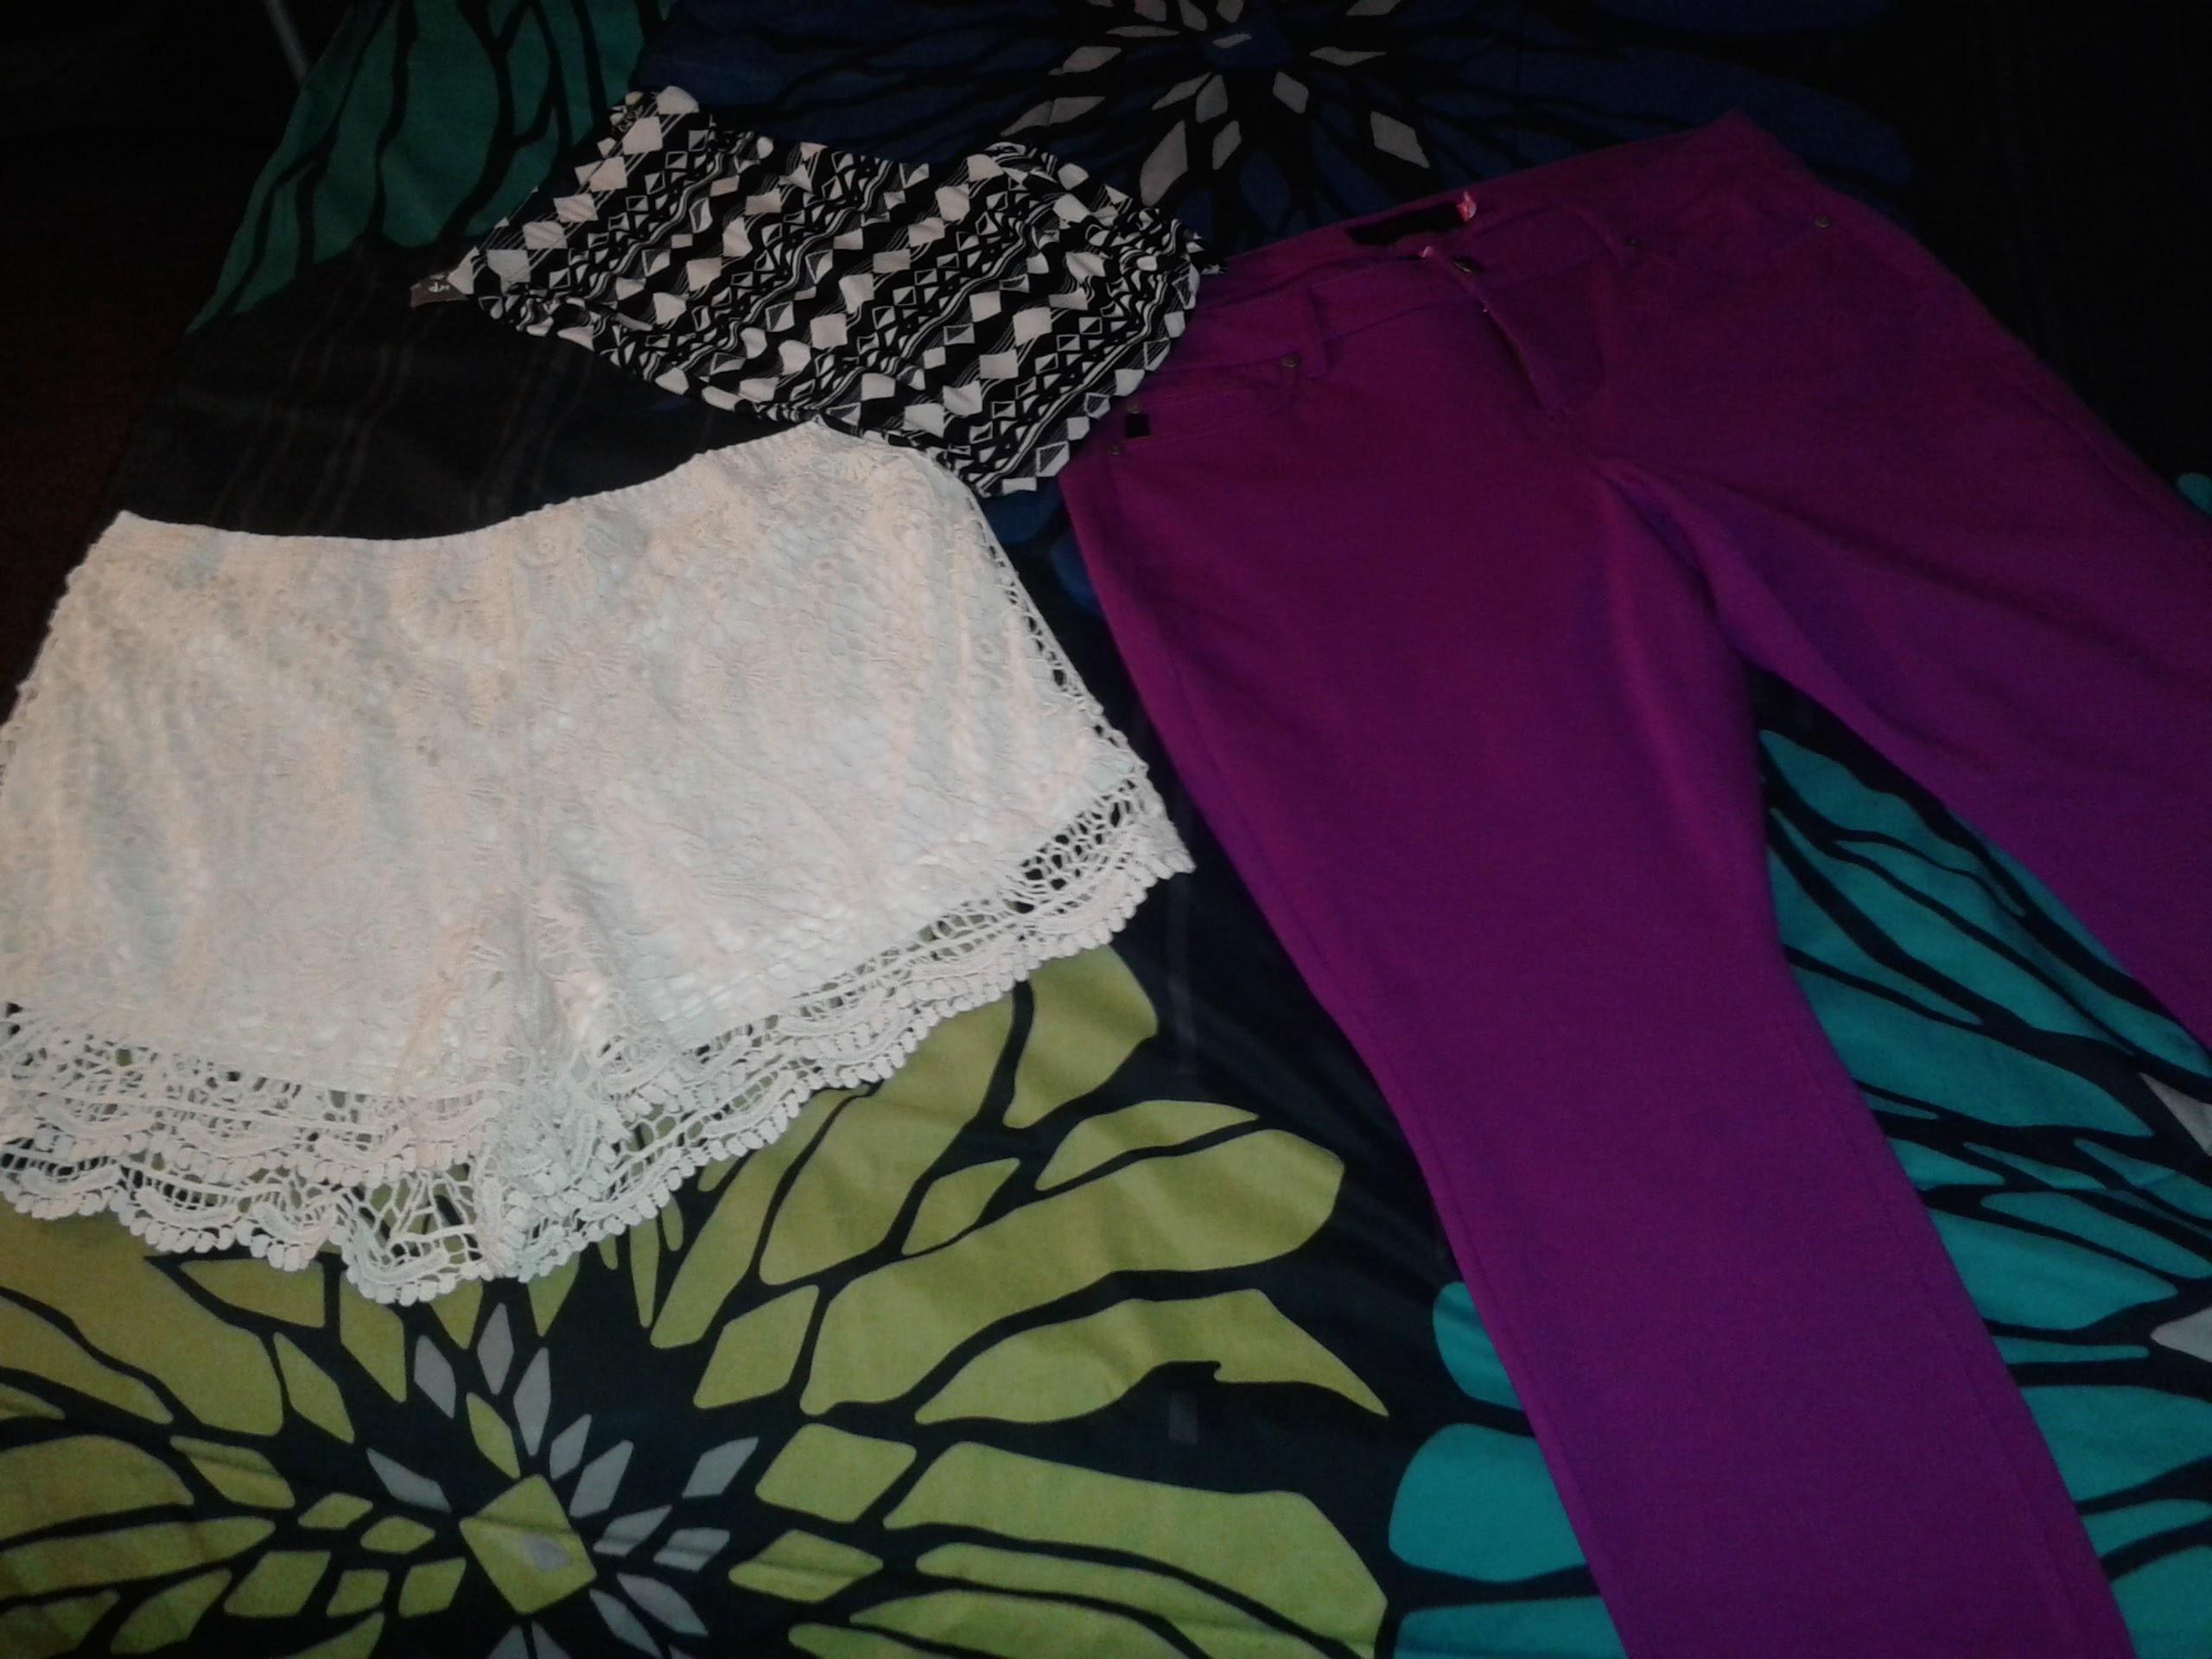 Plus Size Collective Haul - Floral Crochet Shorts, Aztec Leggings & Colored Skinnies!